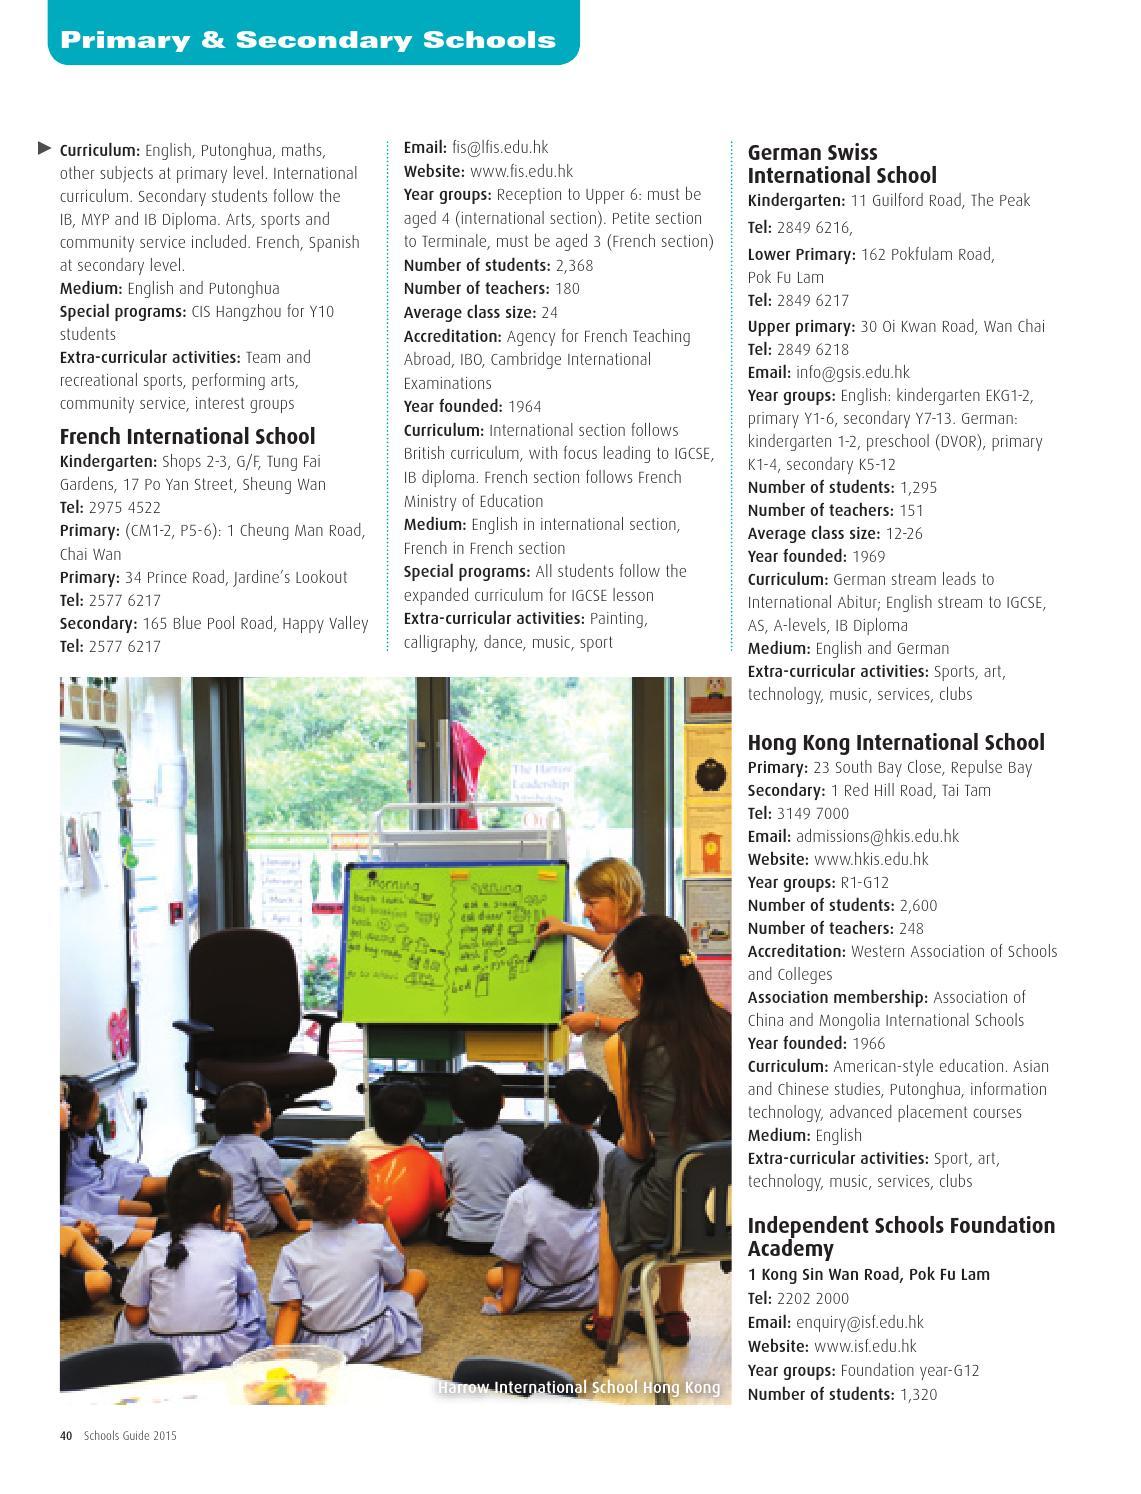 Secondary School List Hong Kong - School Style